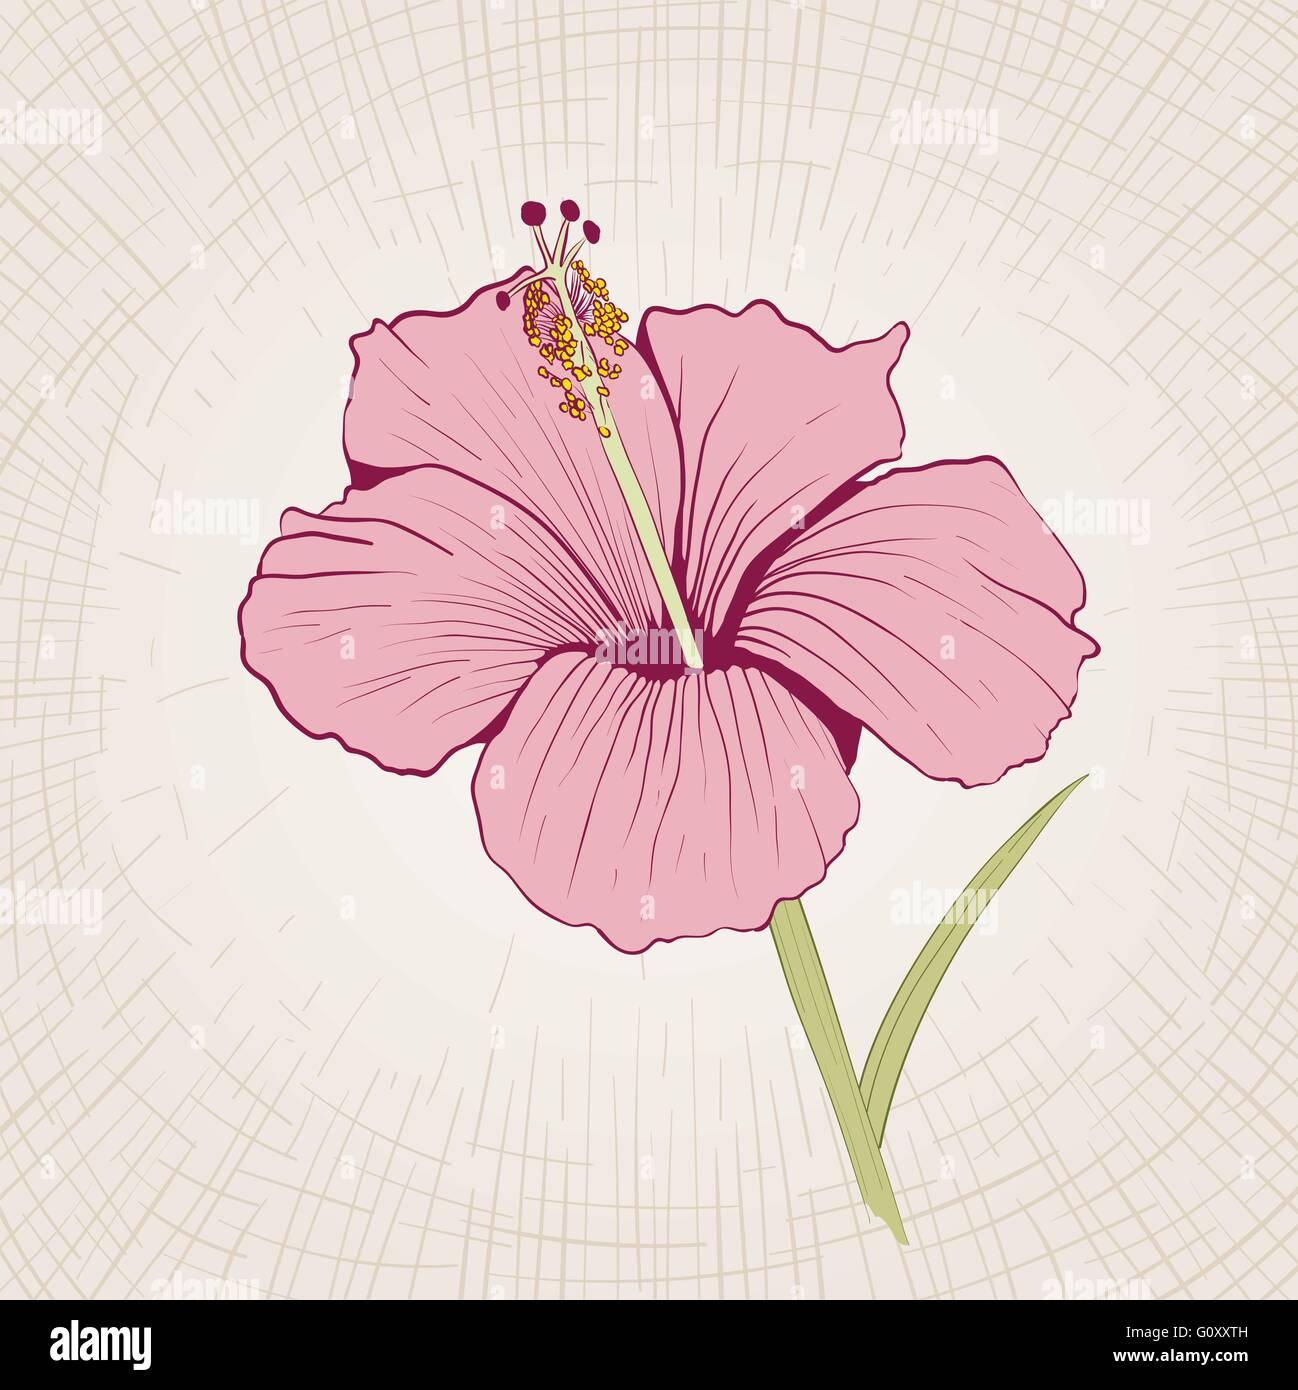 Hibiscus Flower Drawing Stock Photos Hibiscus Flower Drawing Stock